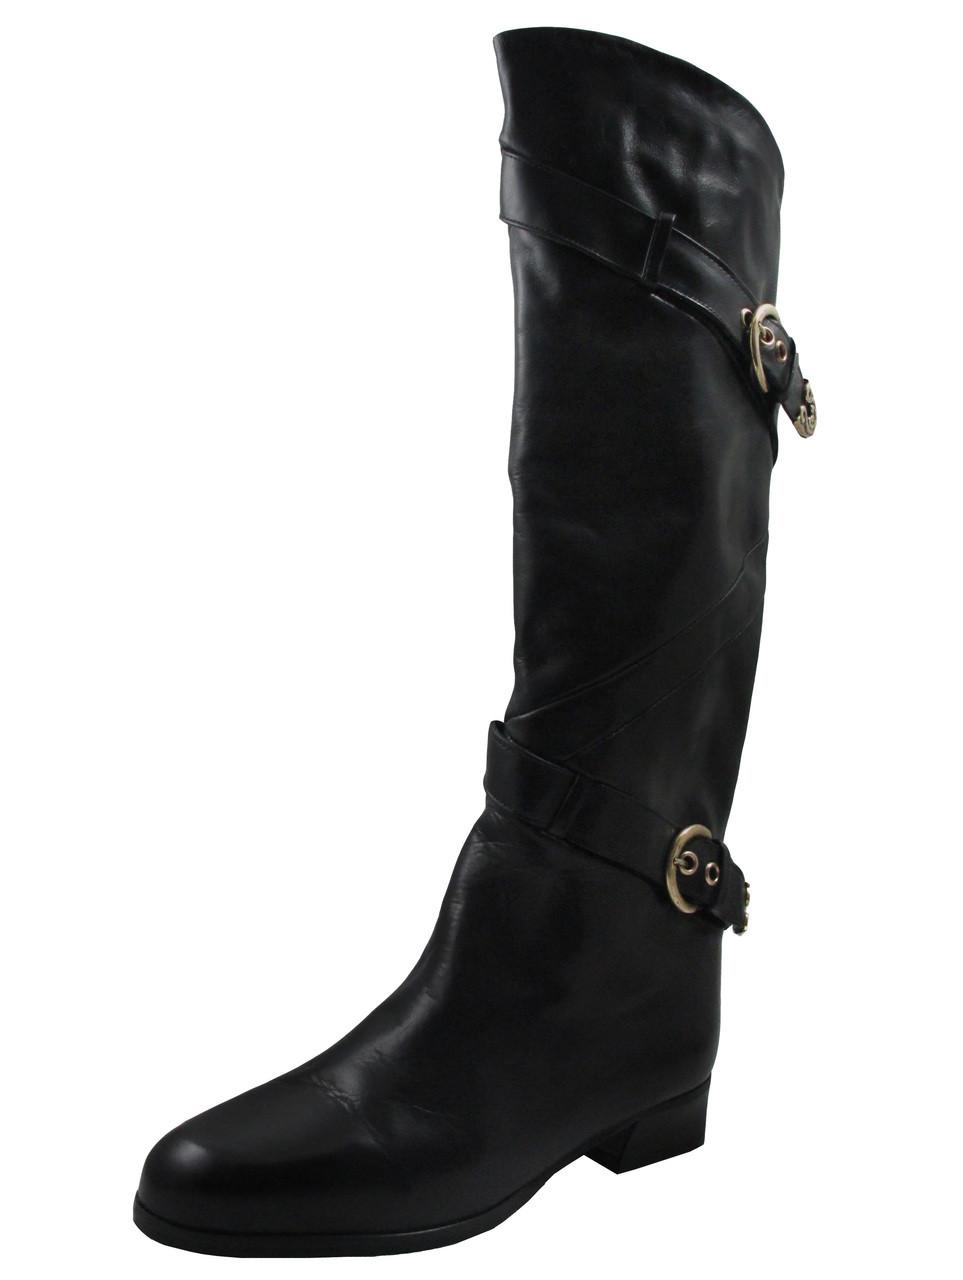 310 Knee Hi Italian Leather boots